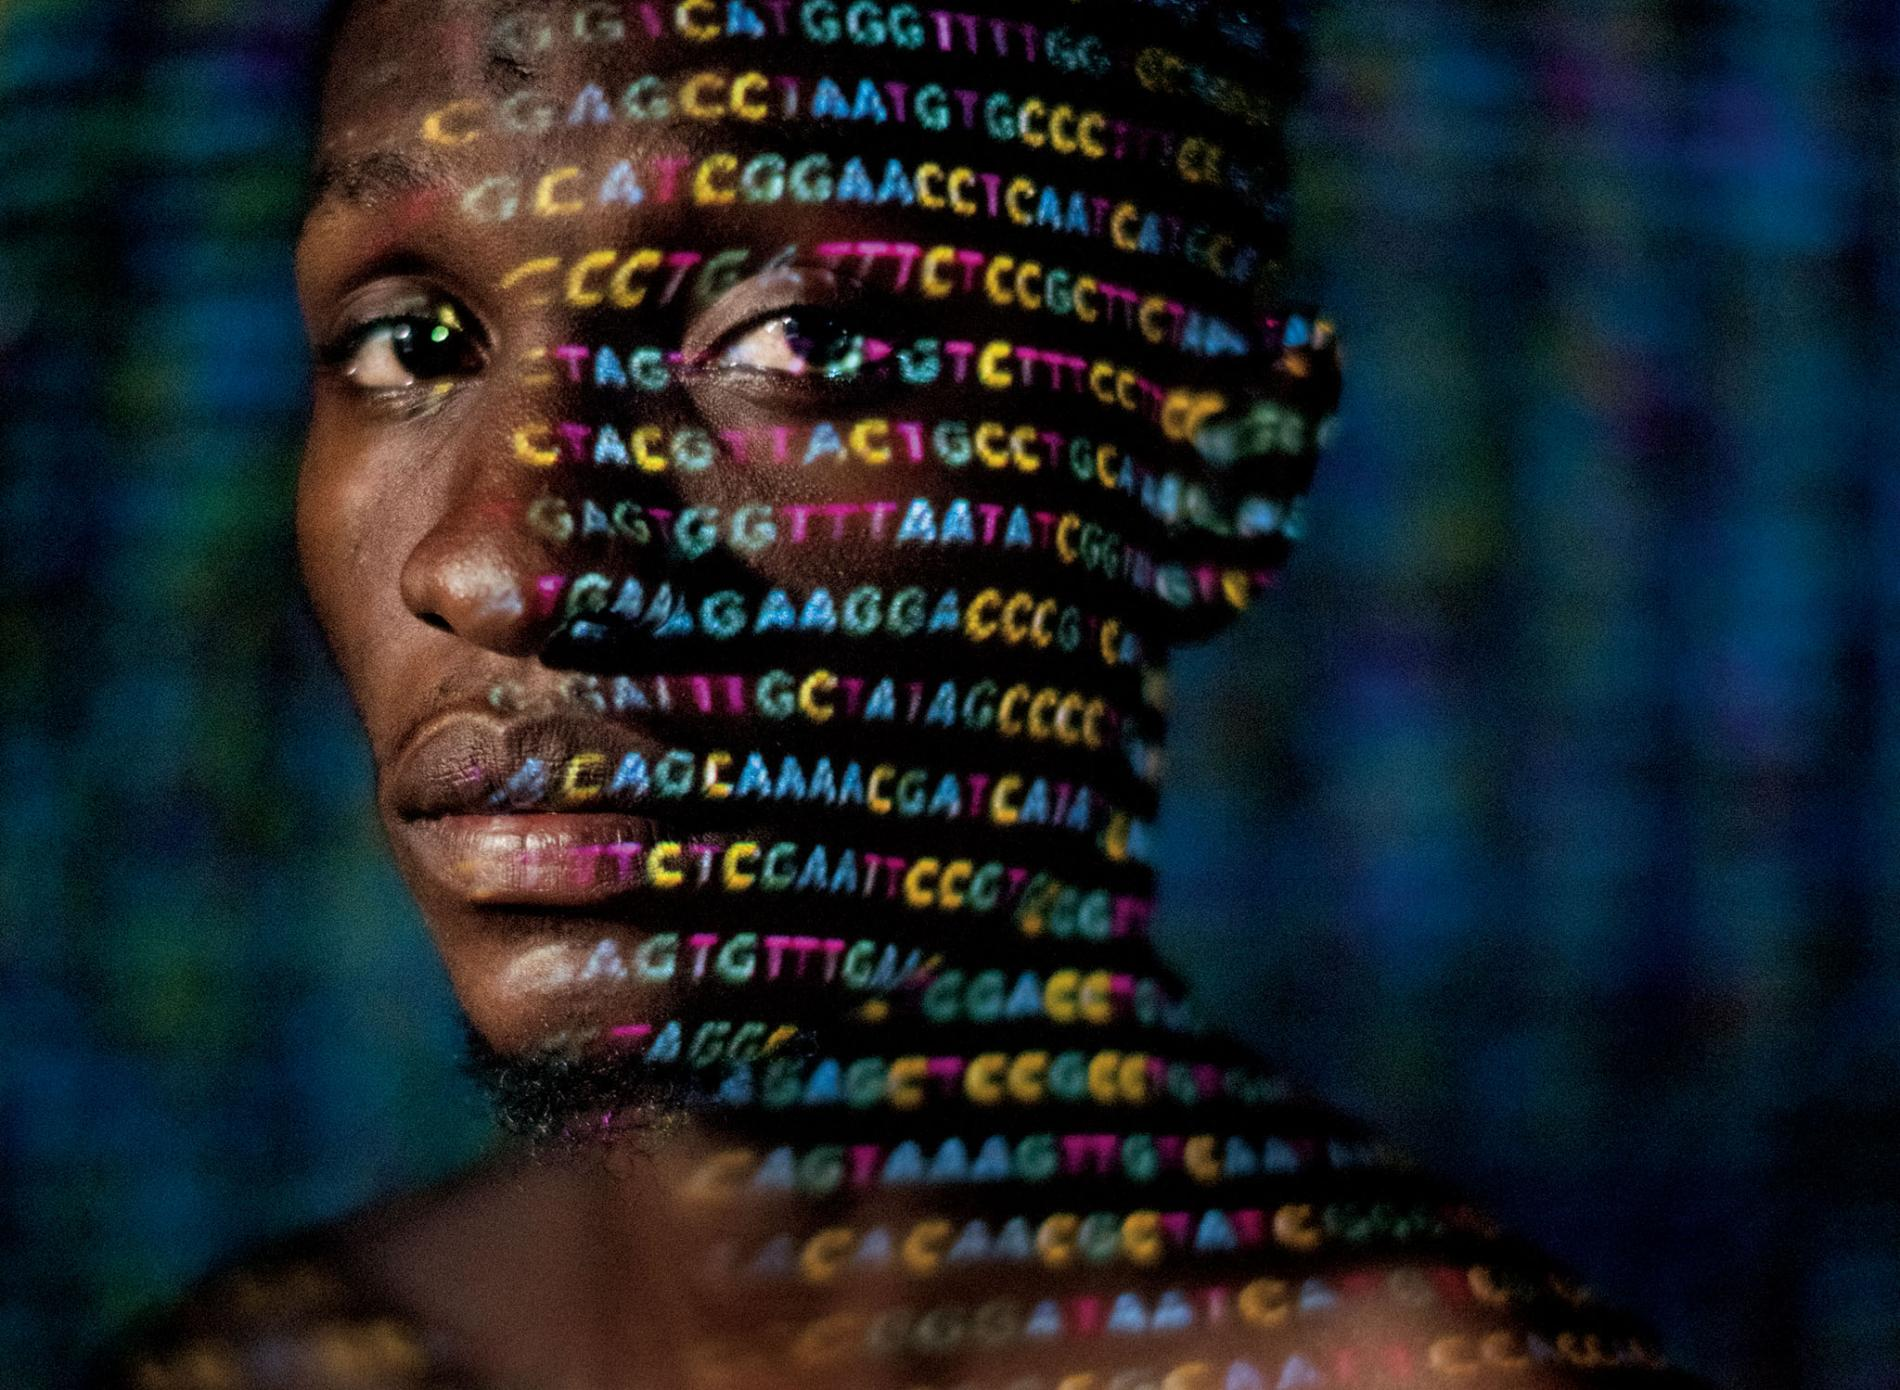 Race, Race Theory, Origin of Man, Creationism, Evolution, African American Race, Black Race, Ethnicity, African American News, KOLUMN Magazine, KOLUMN